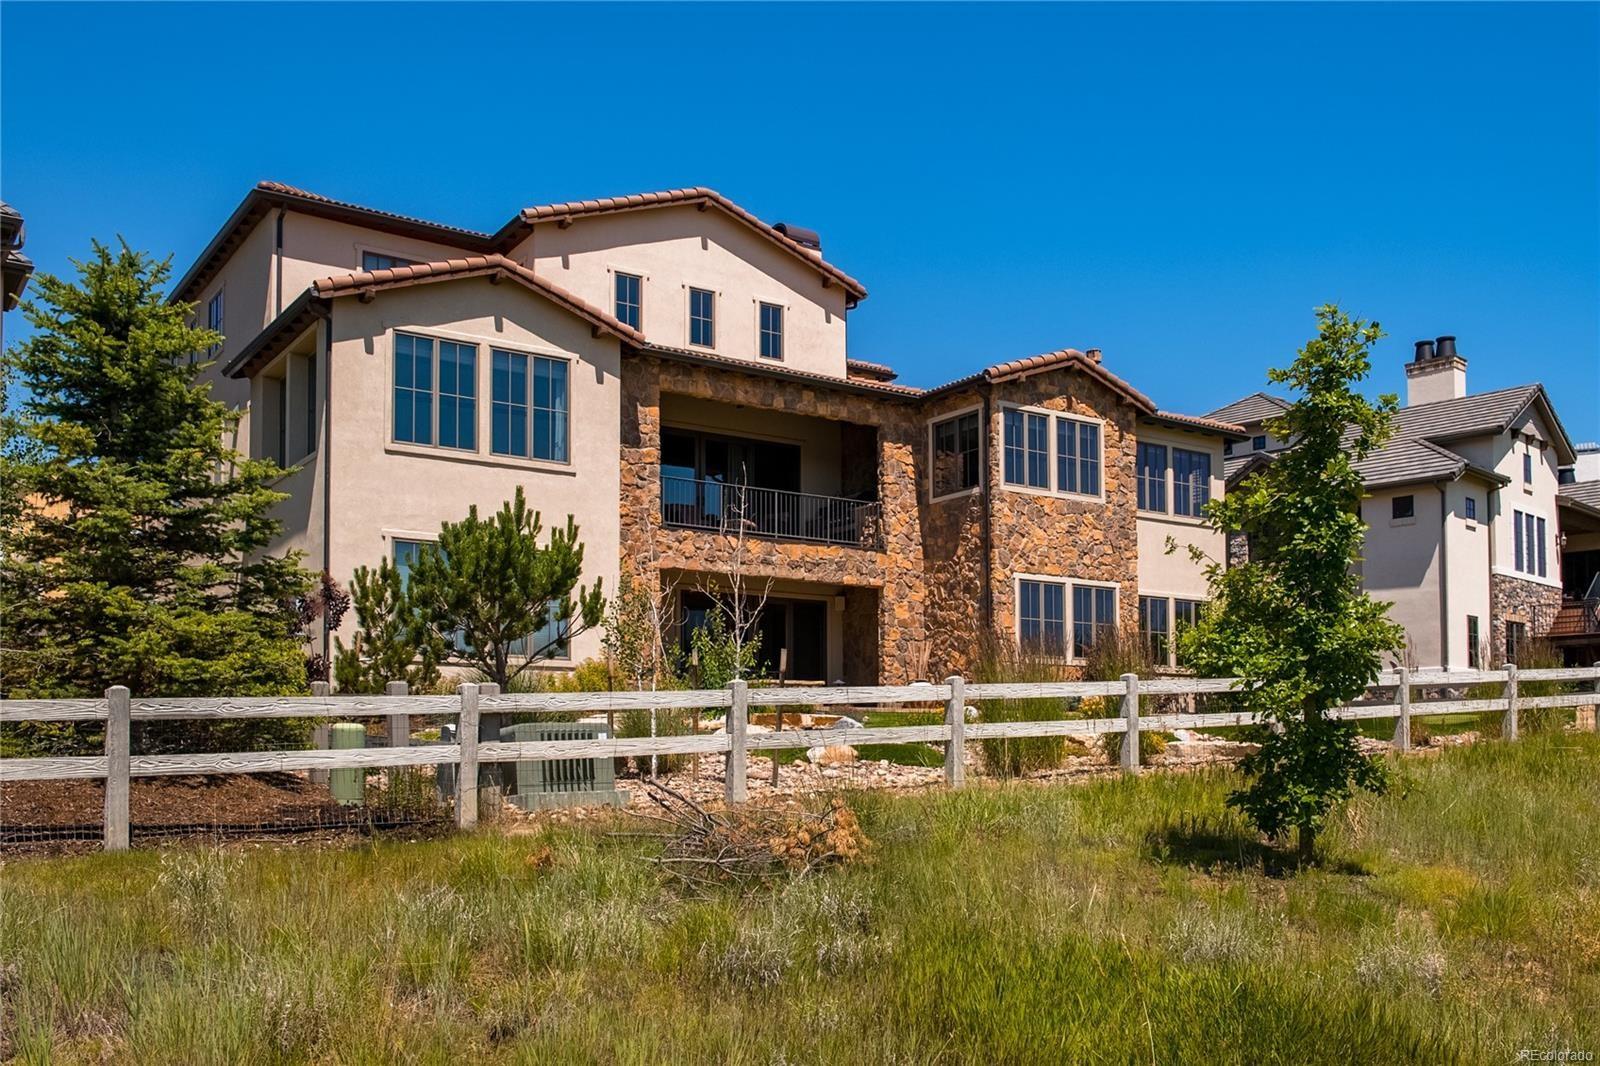 MLS# 8045685 - 38 - 40 Flowerburst Way, Highlands Ranch, CO 80126